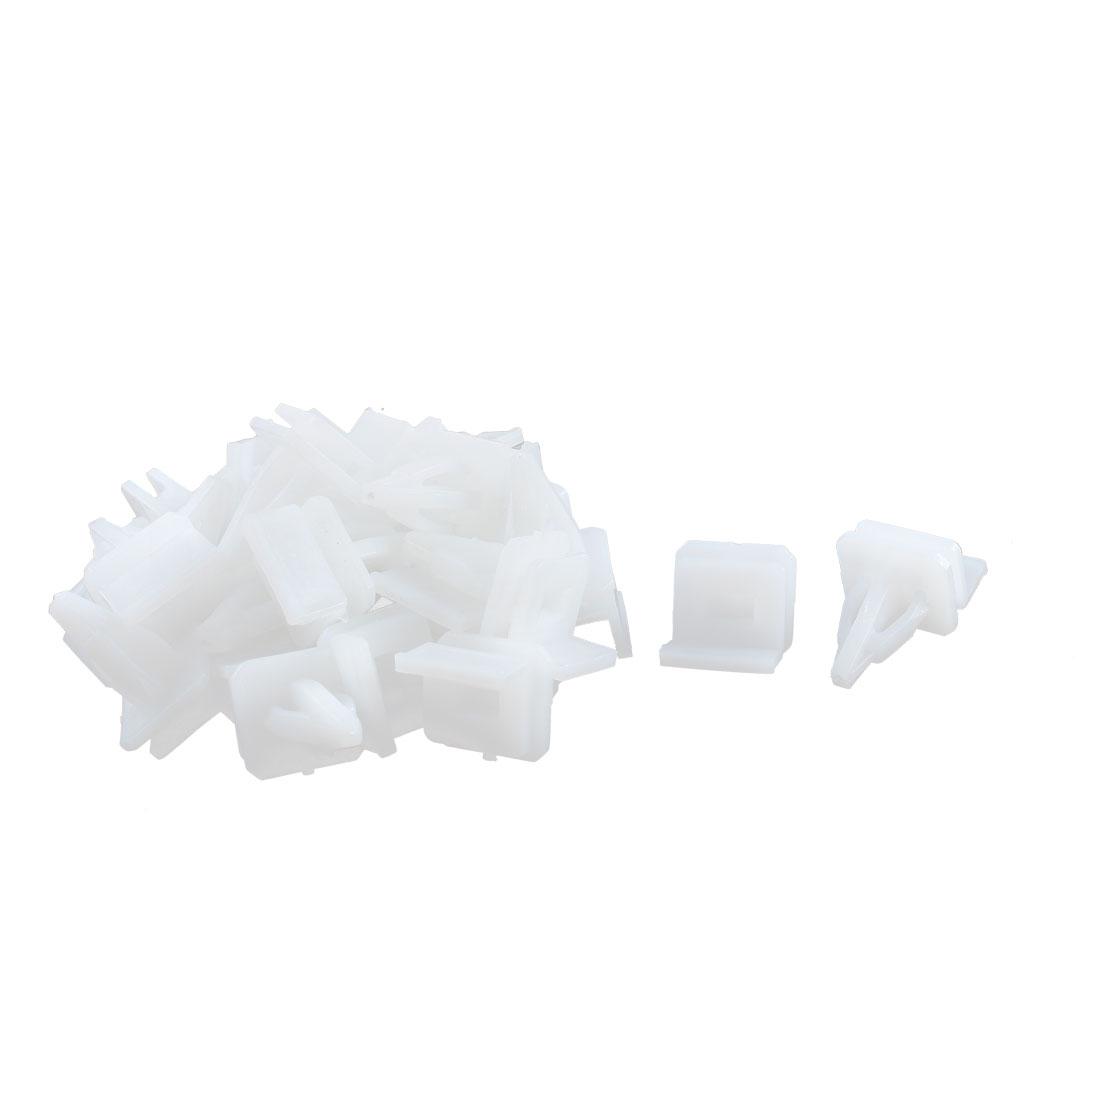 22Pcs White Door Card Interior Weatherstrip Moulding Retainer Clip for Honda